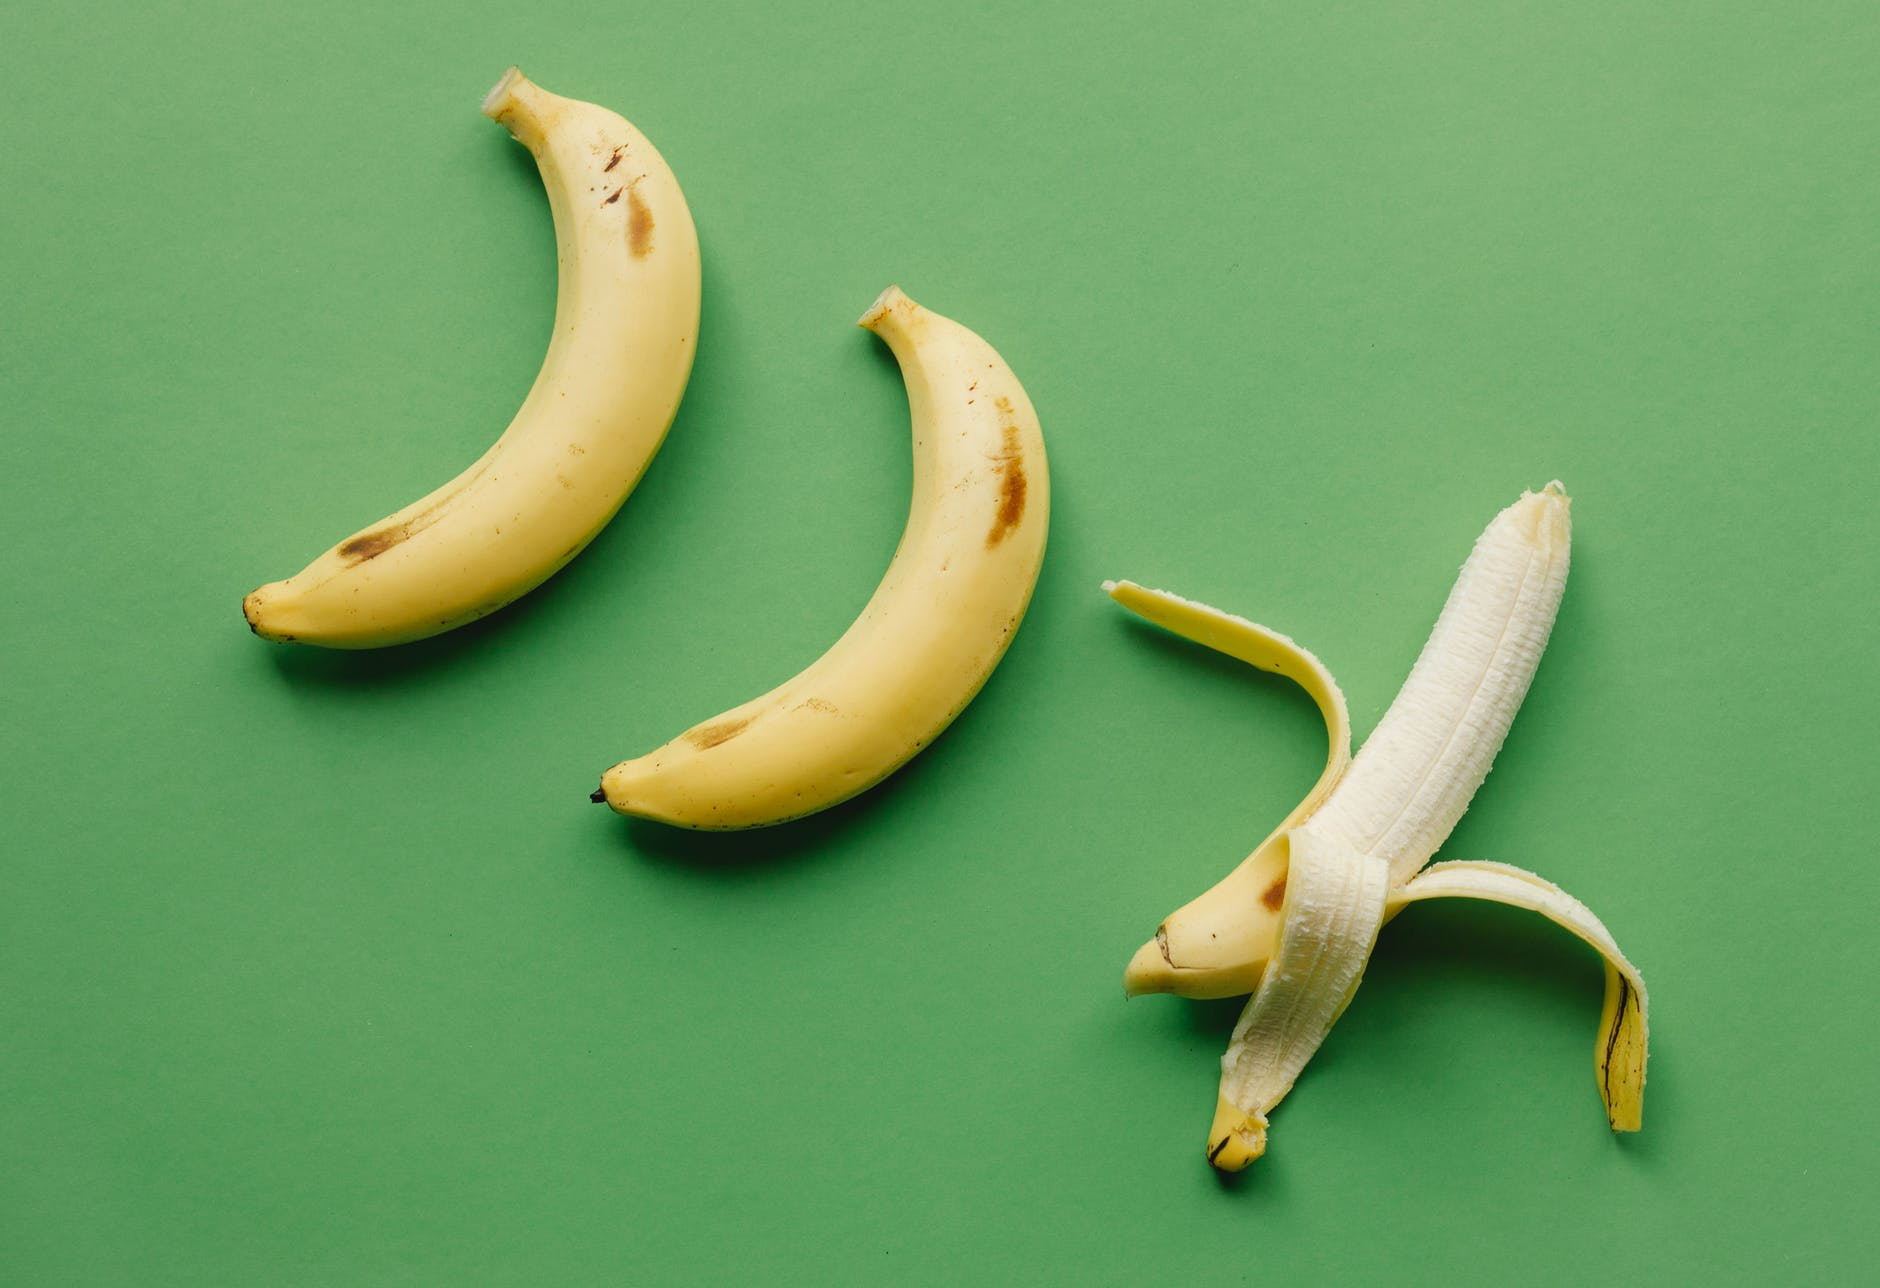 ripe bananas on green surface